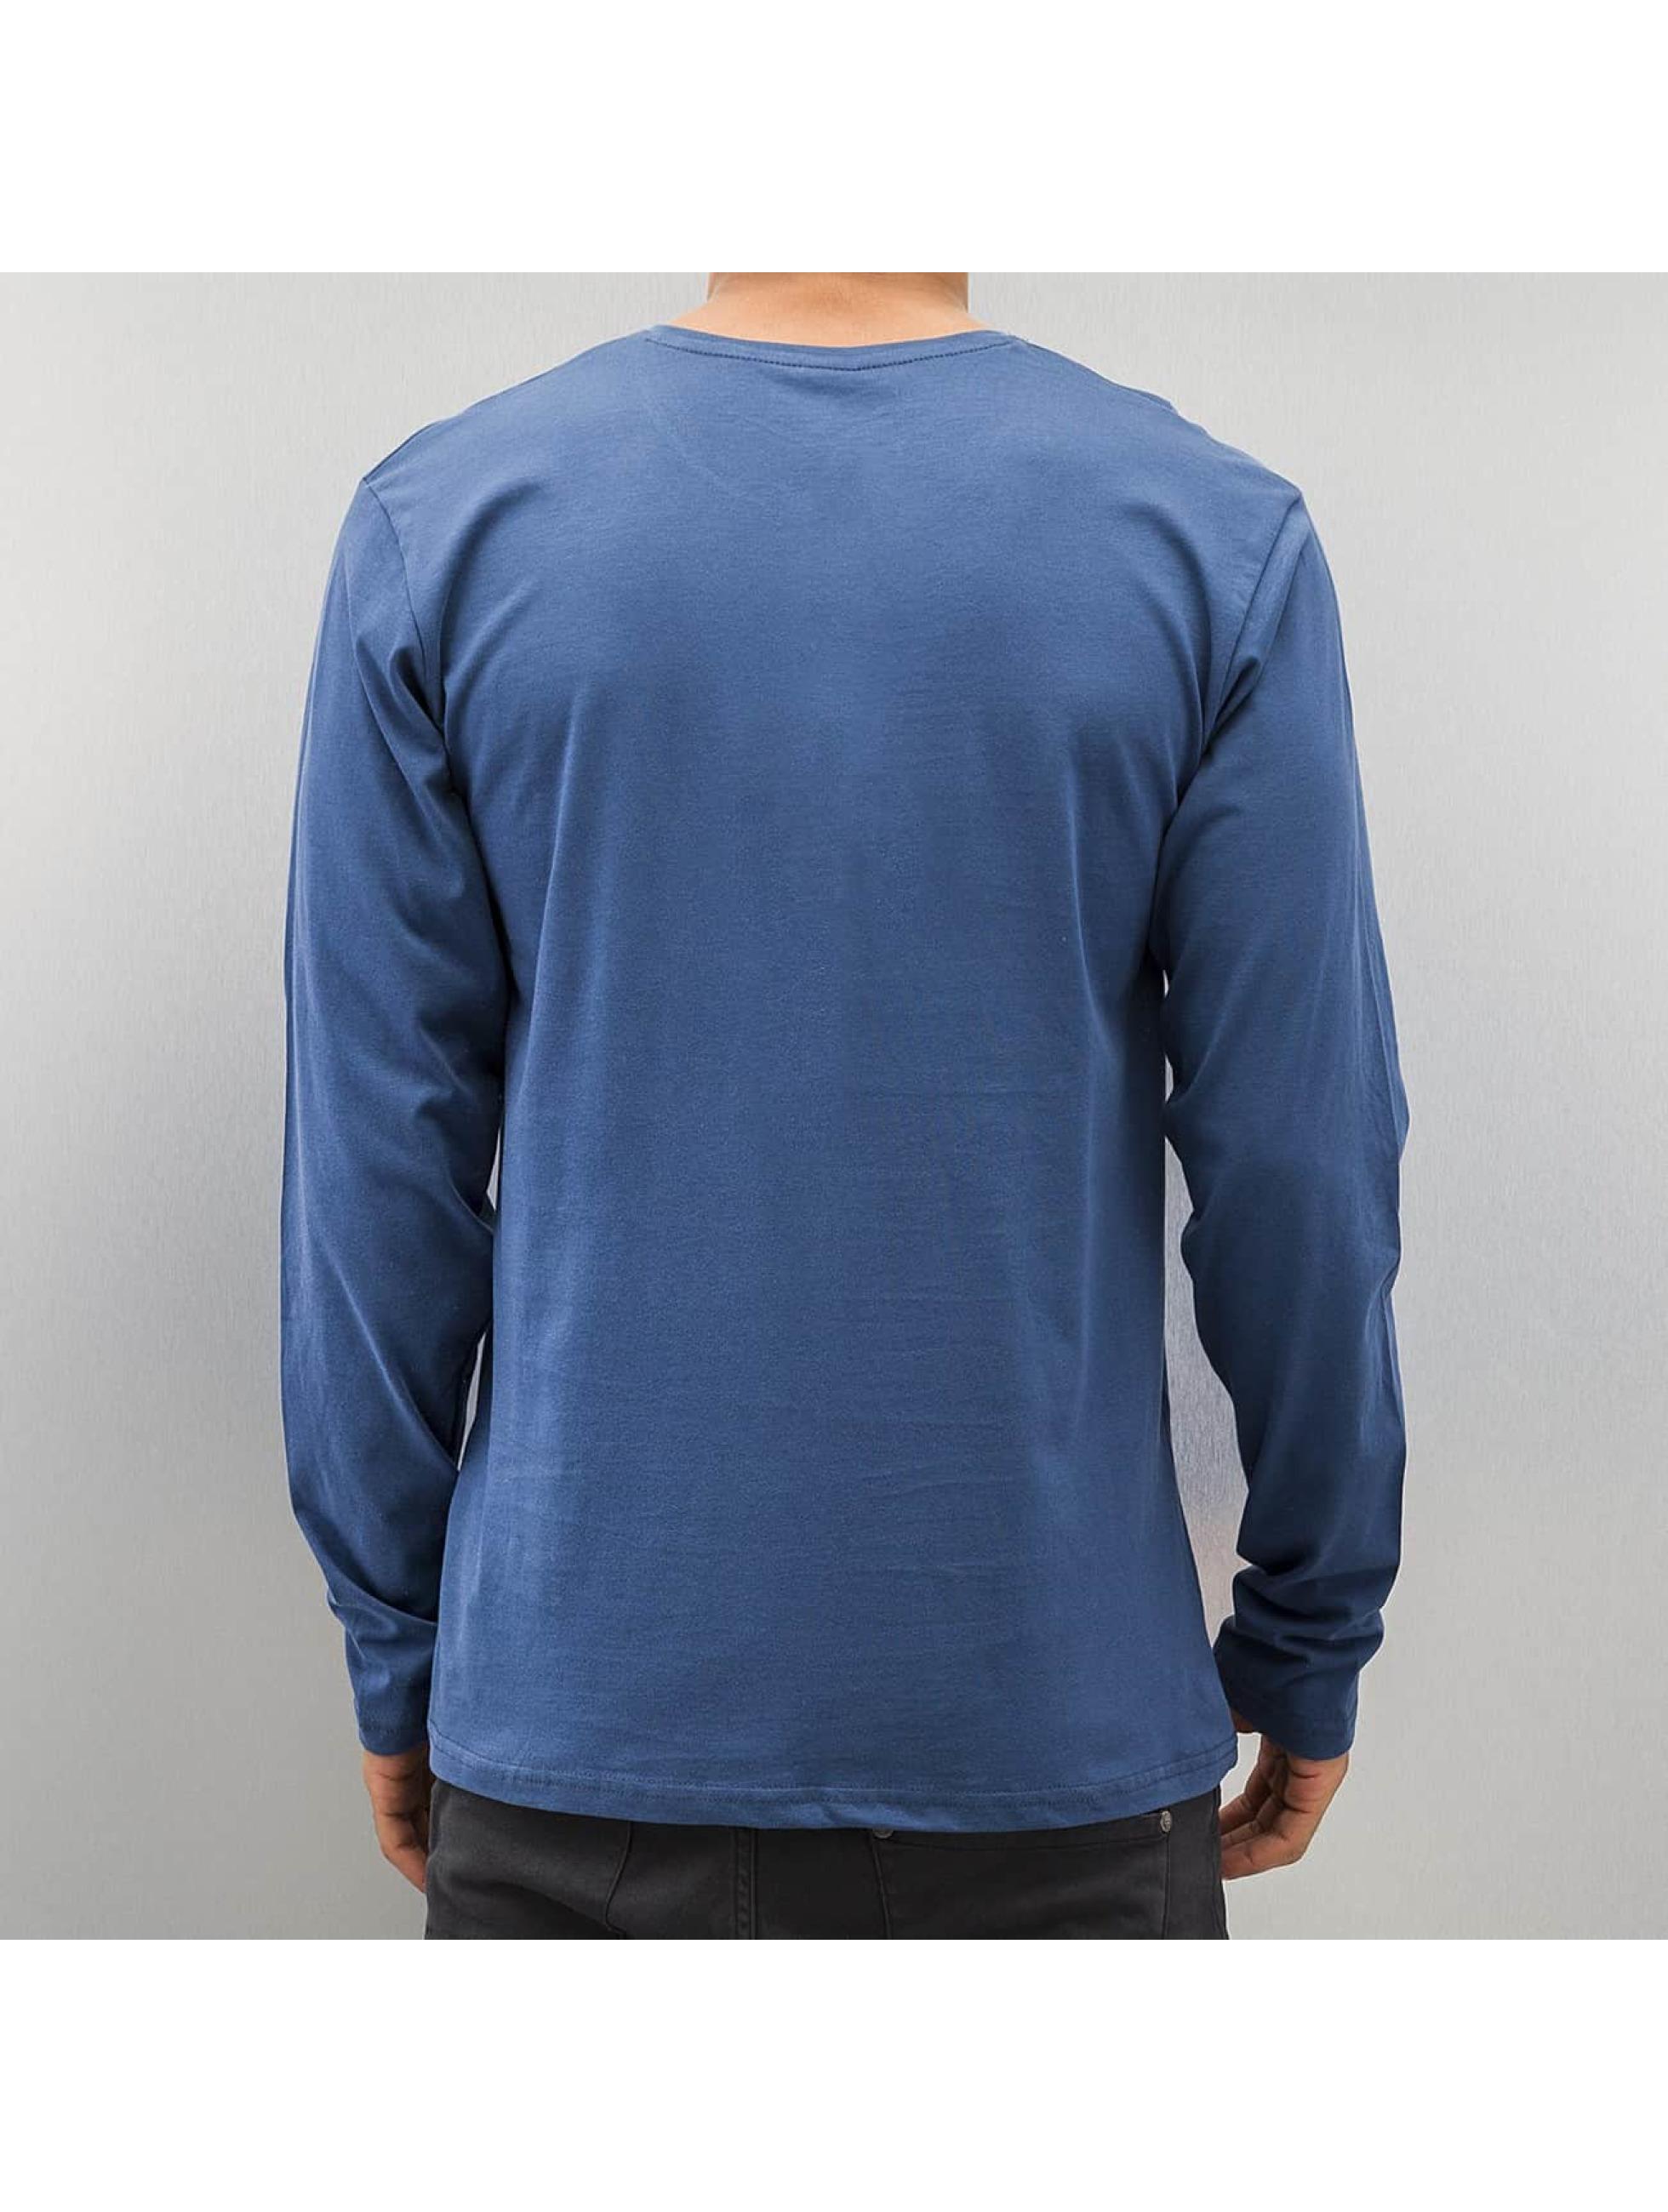 Cazzy Clang Longsleeve Padua blauw